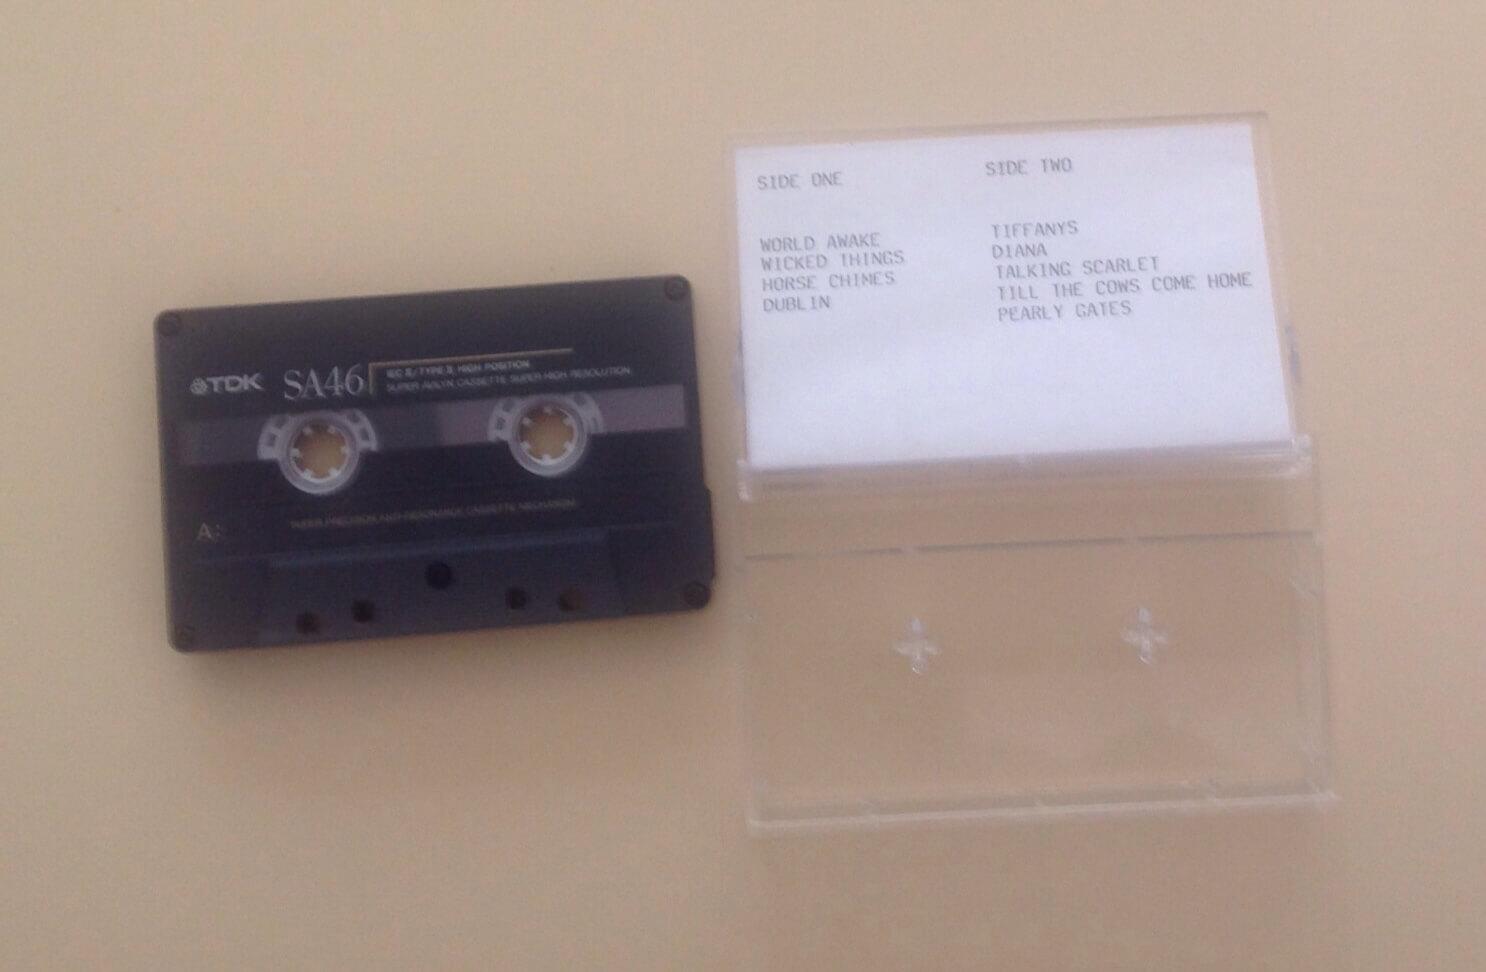 CBS Tape Copy